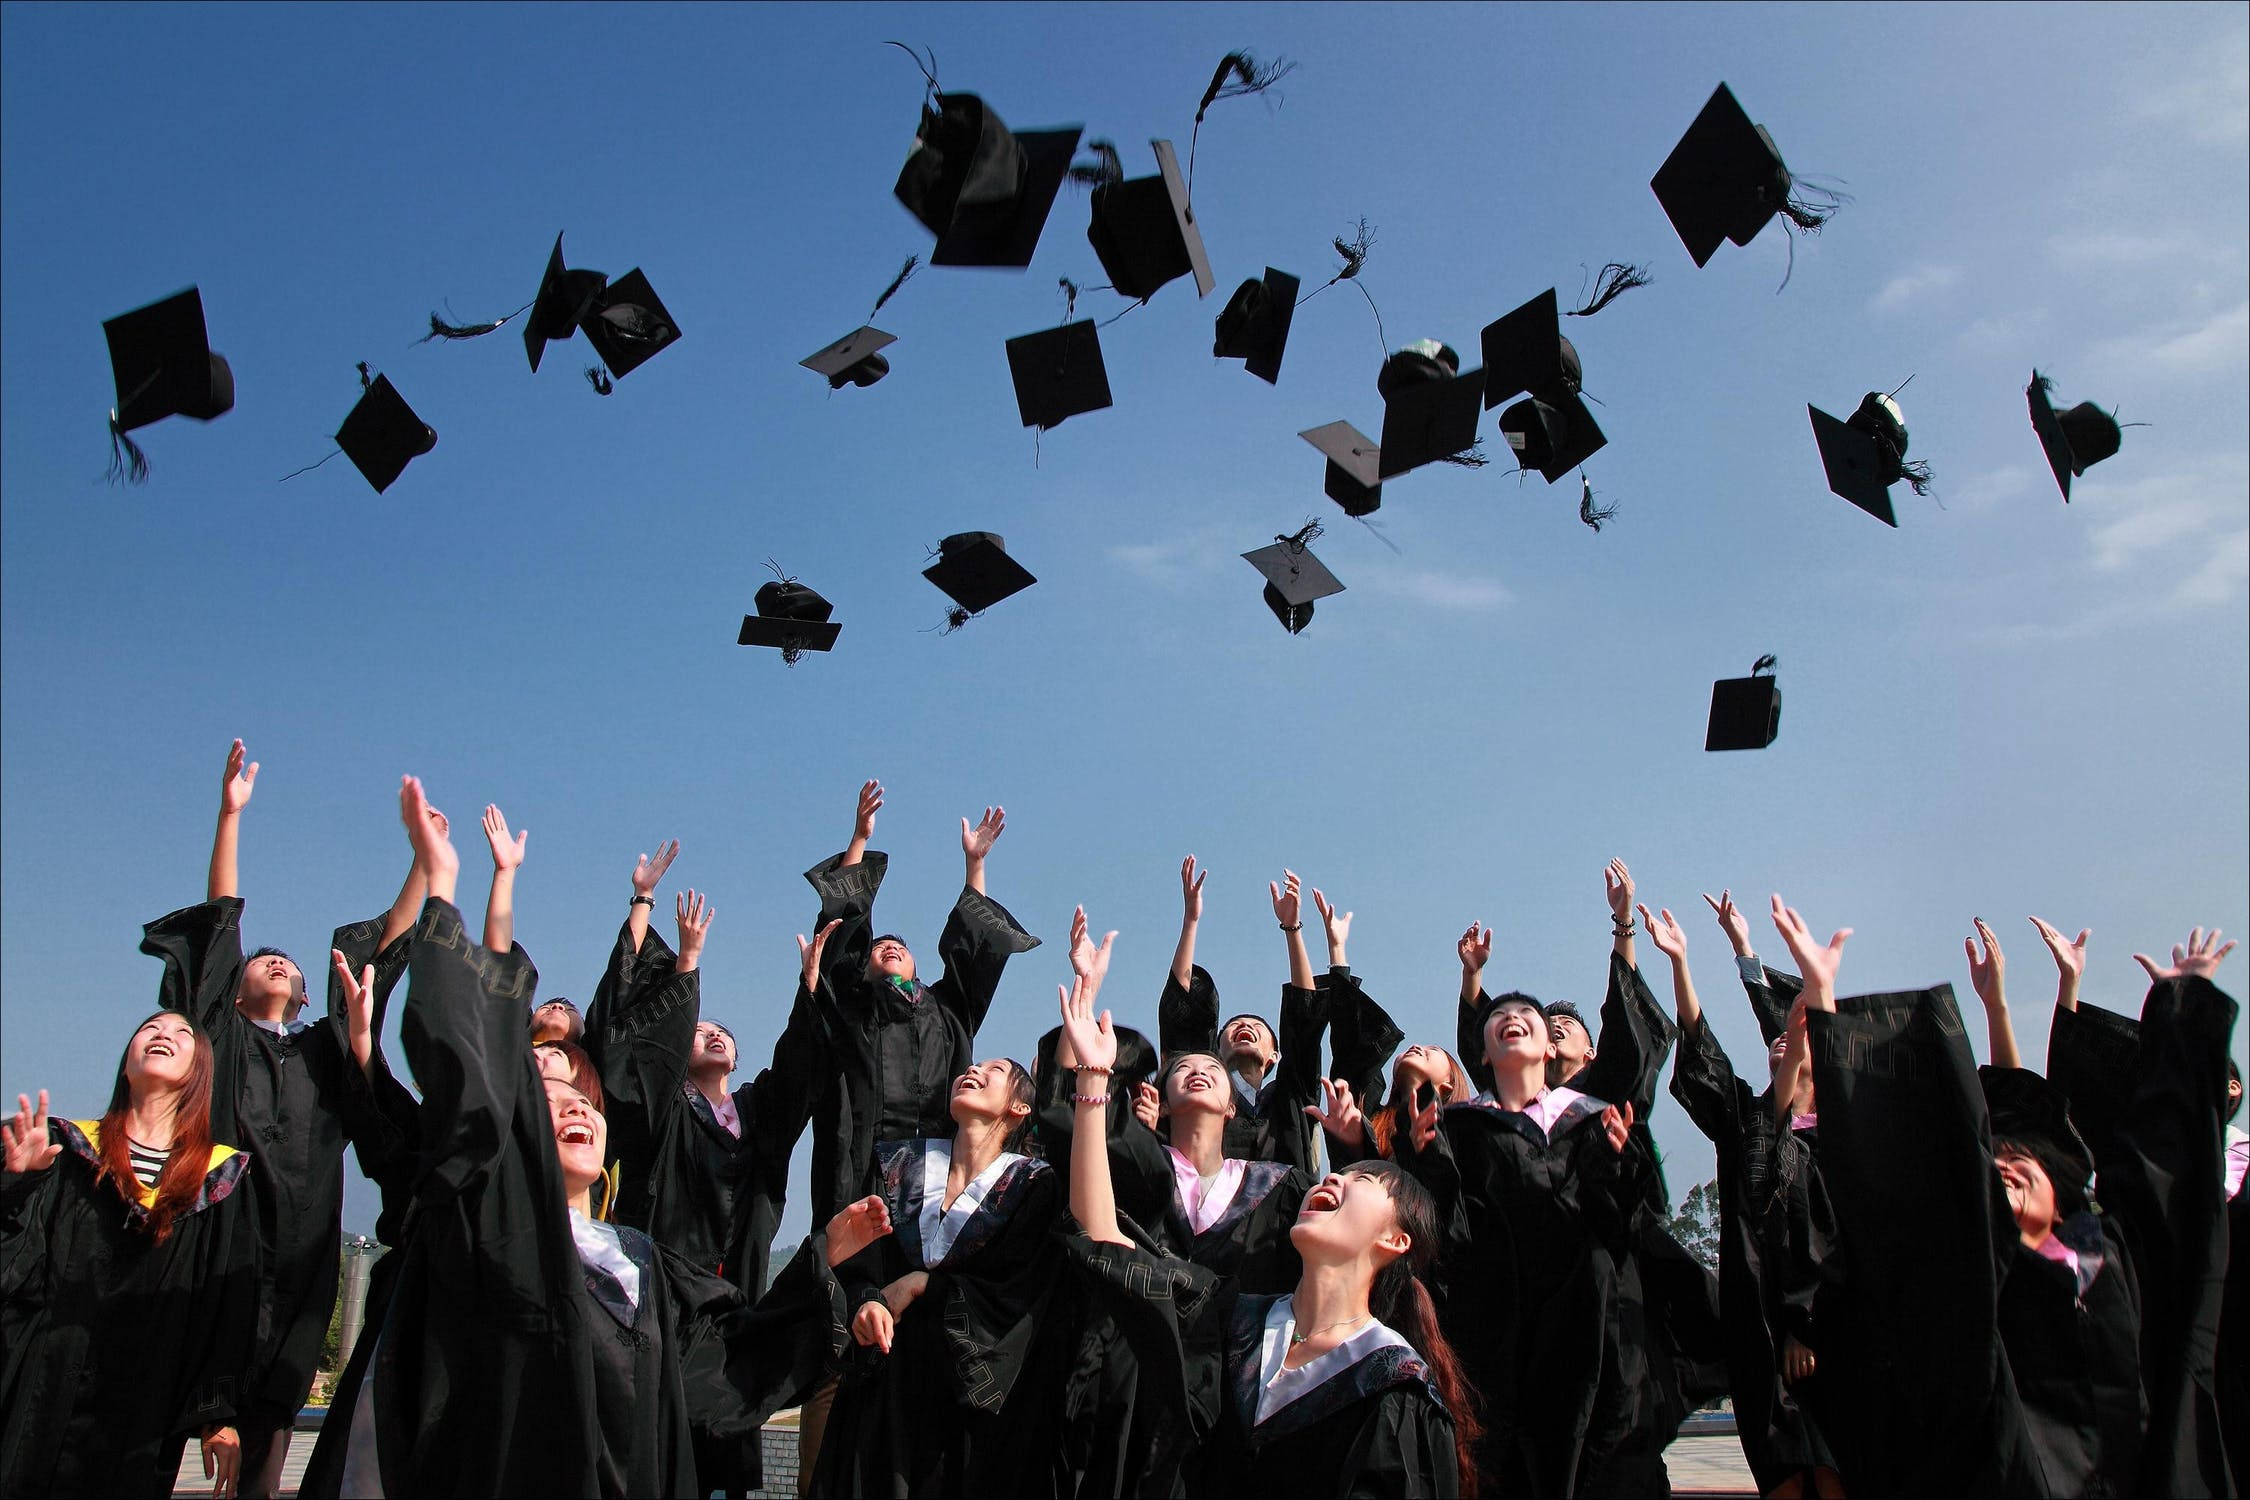 tips for your graduate|tips-for-your-graduate|graduate-tips